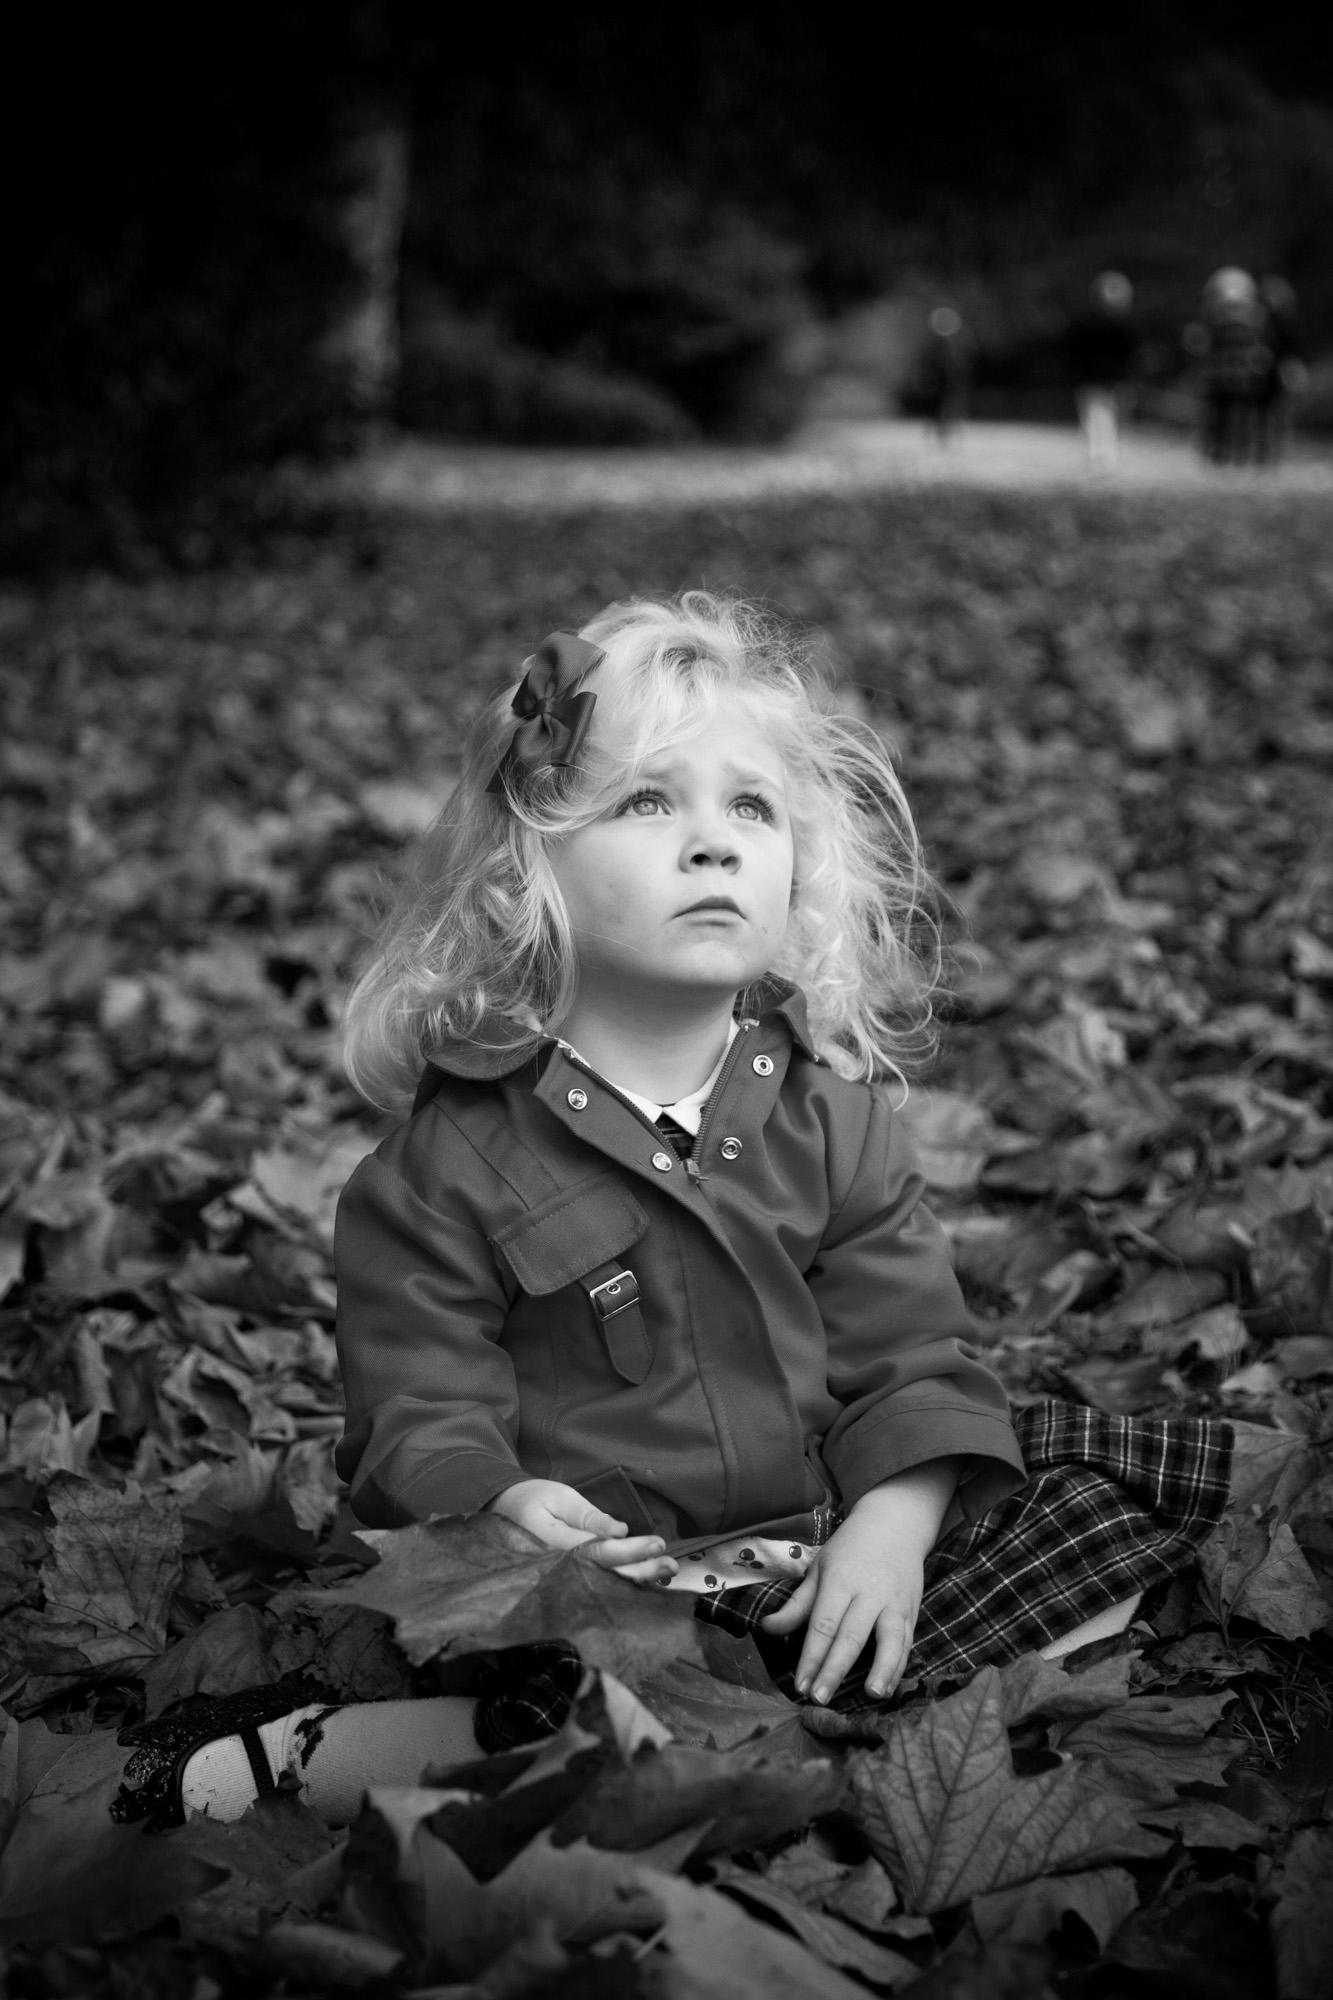 family-life-family-photographer-oxford-london-jonathan-self-photography-6.jpg